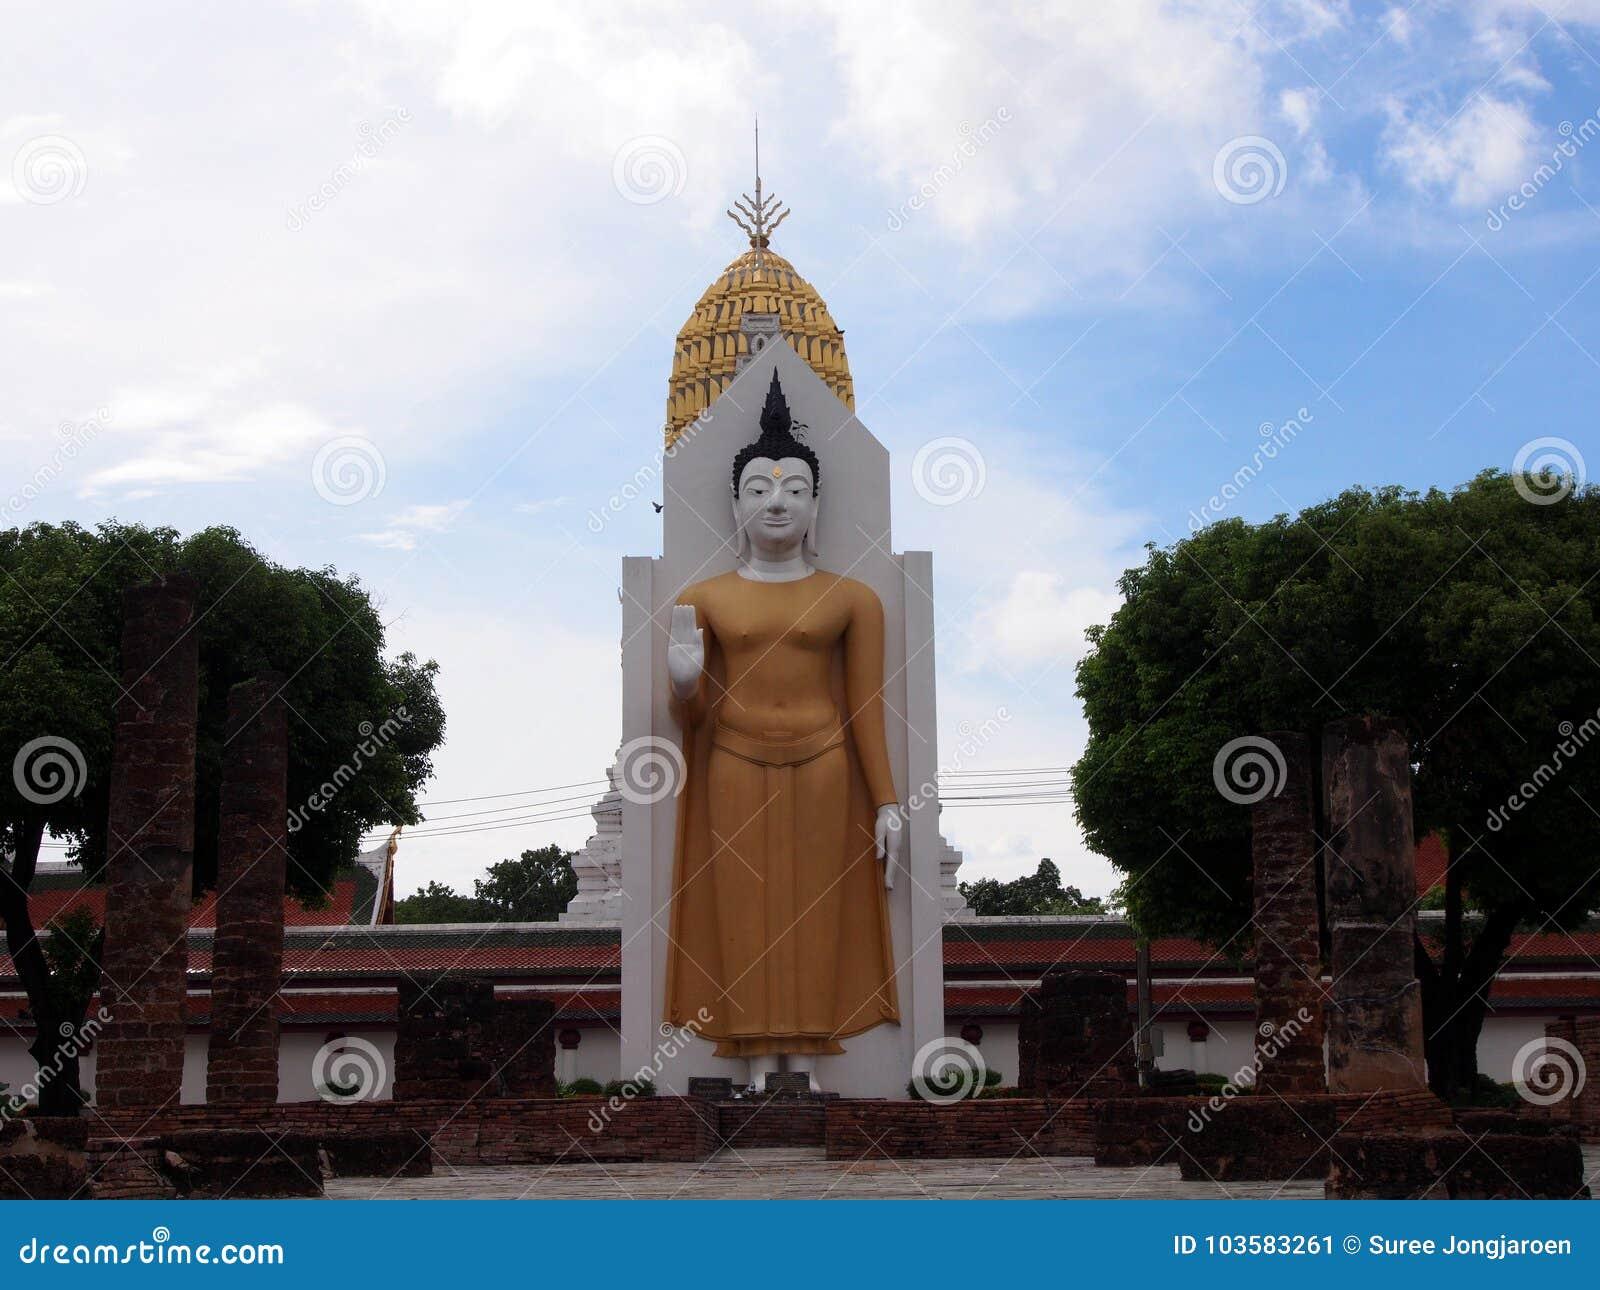 The Buddha in Phisanulok,Thailand